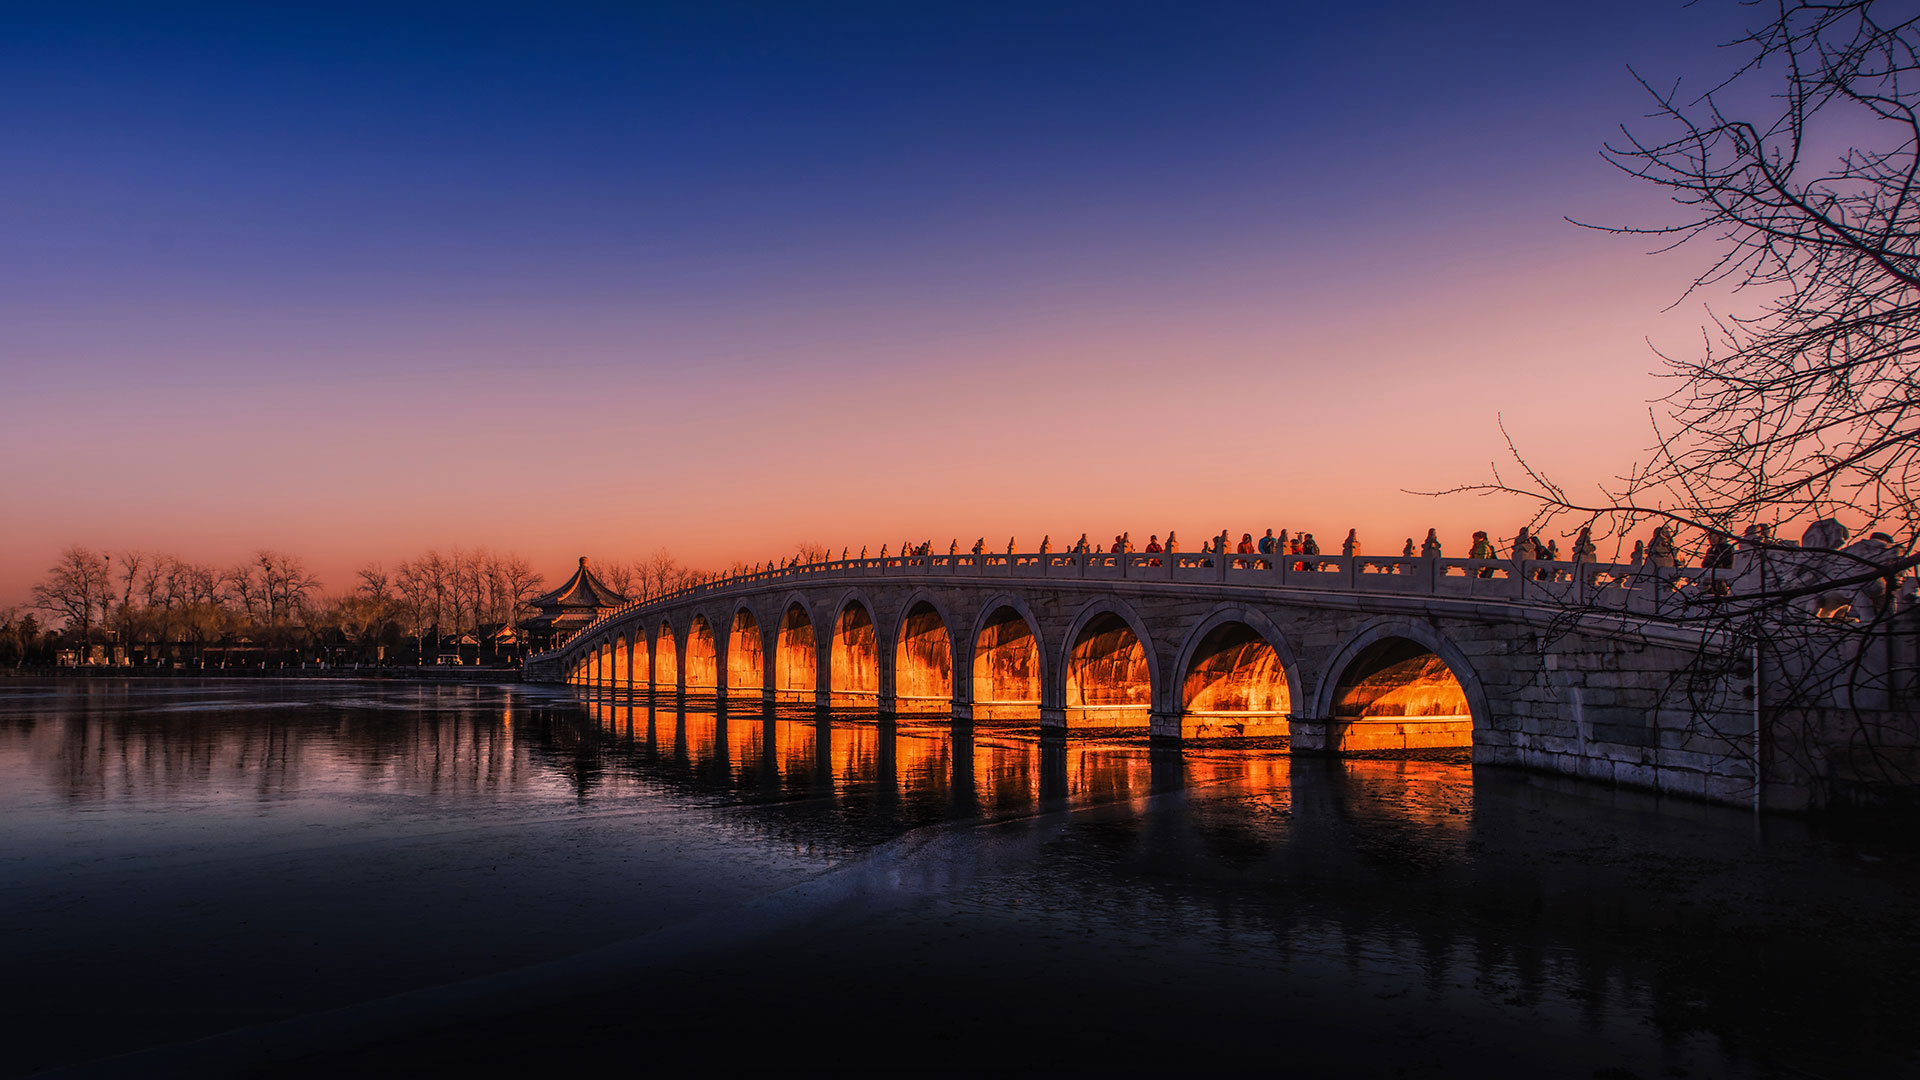 「十七孔橋」中国, 北京 (© Jia Wang/Getty Images)